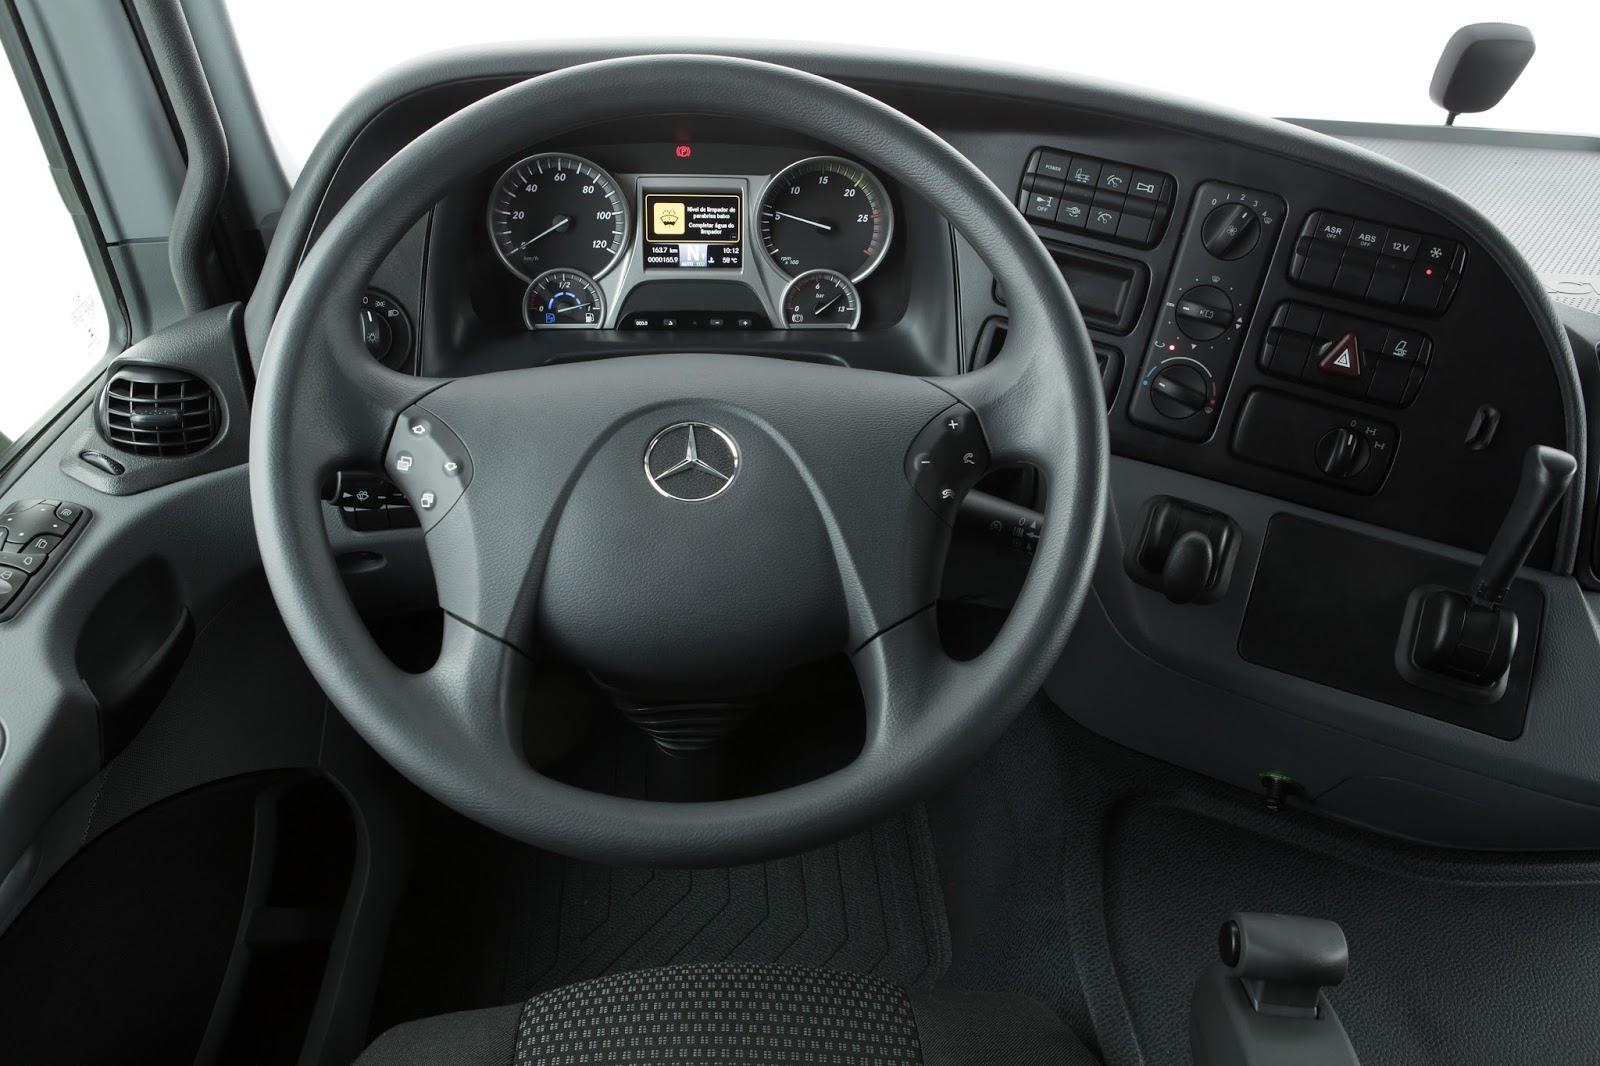 Mercedes Benz Actros Neupreis